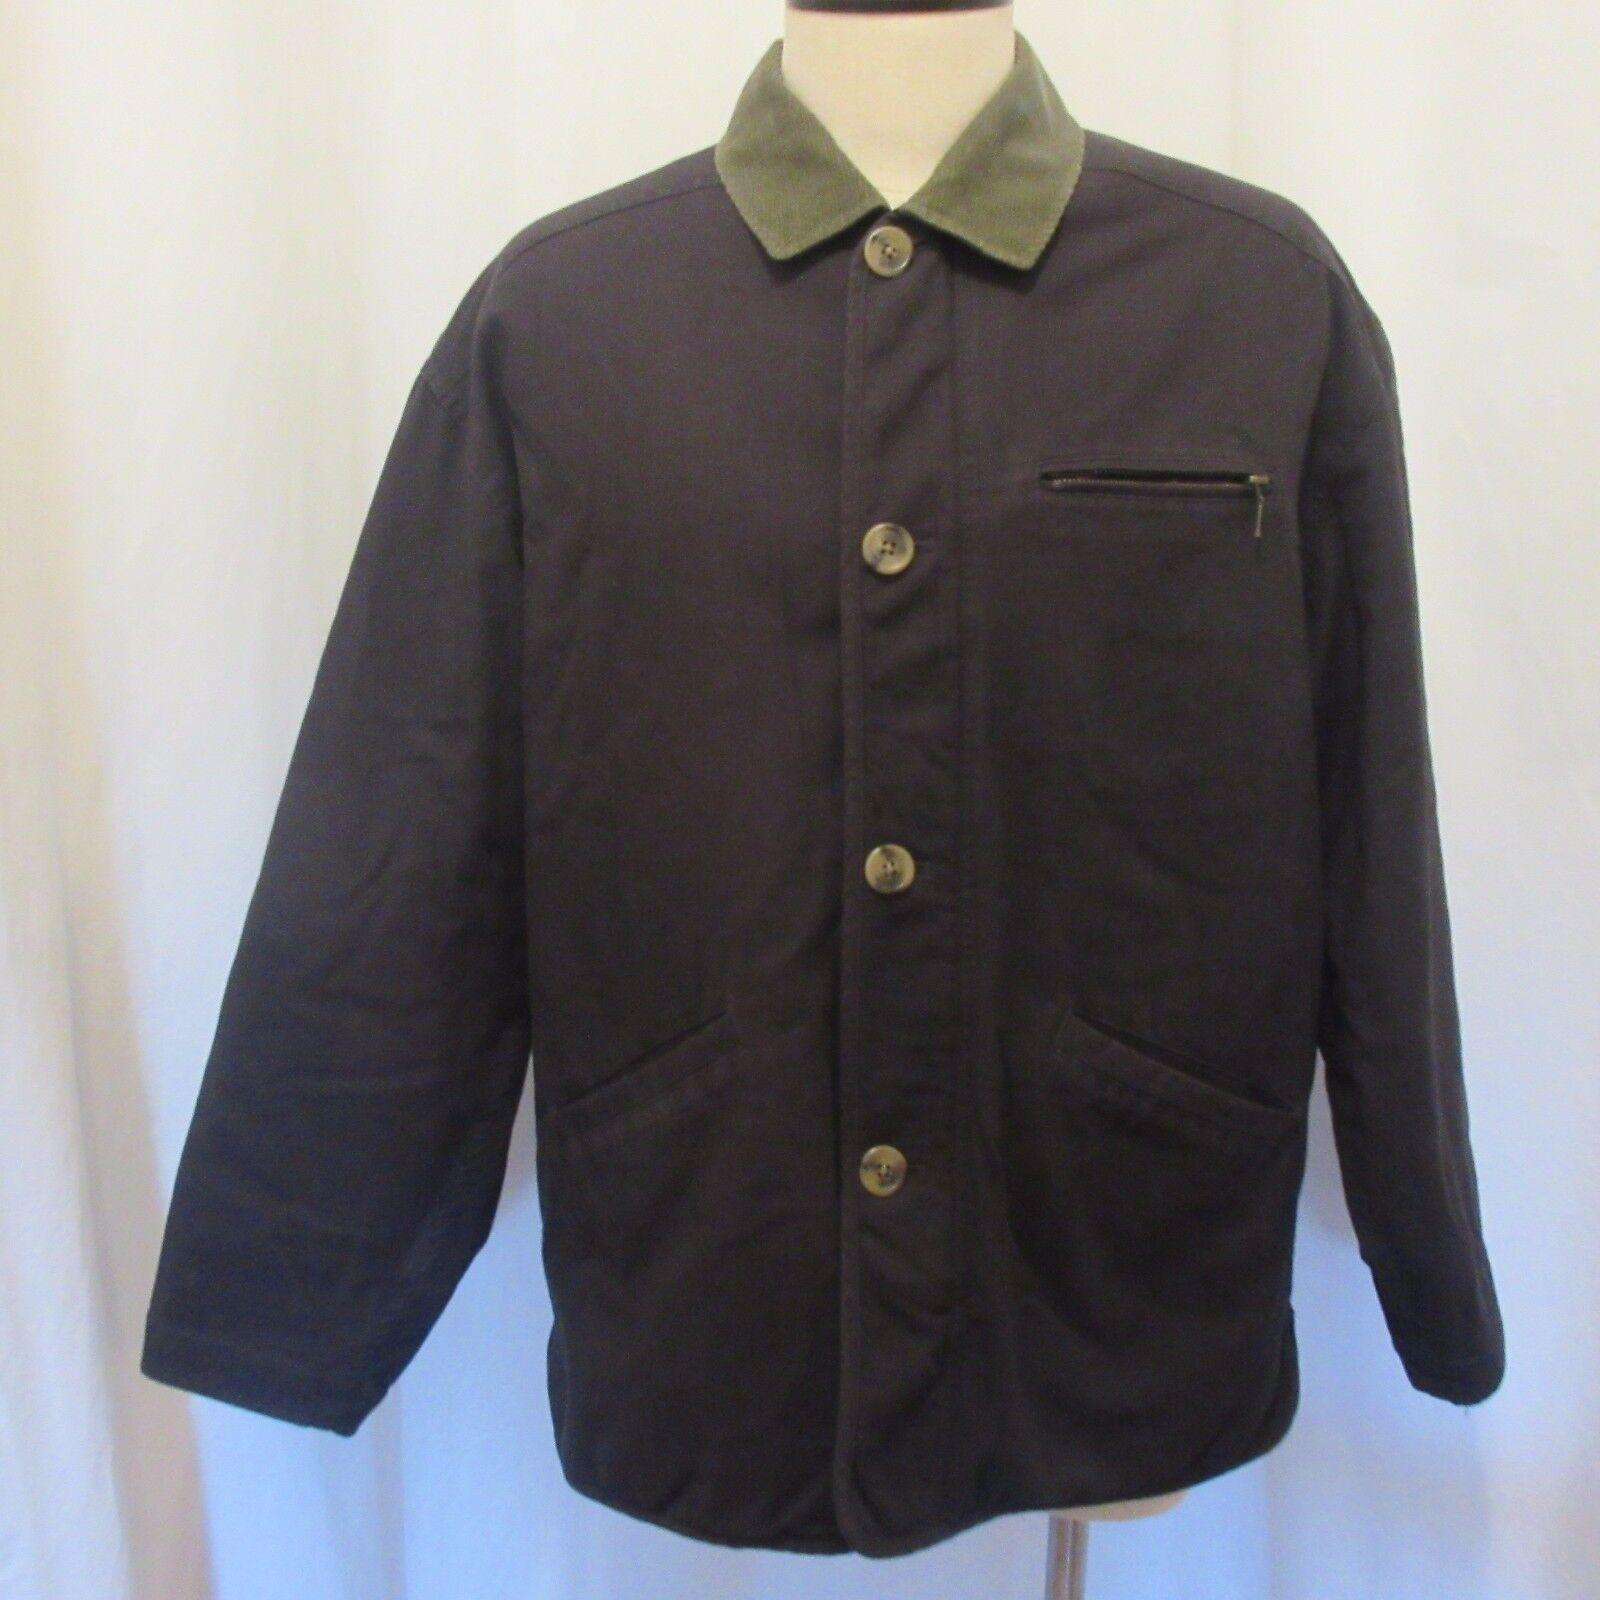 J Crew Coat Sz L Barn Work bluee Zip Up Green Corduroy Collar Striped Lining